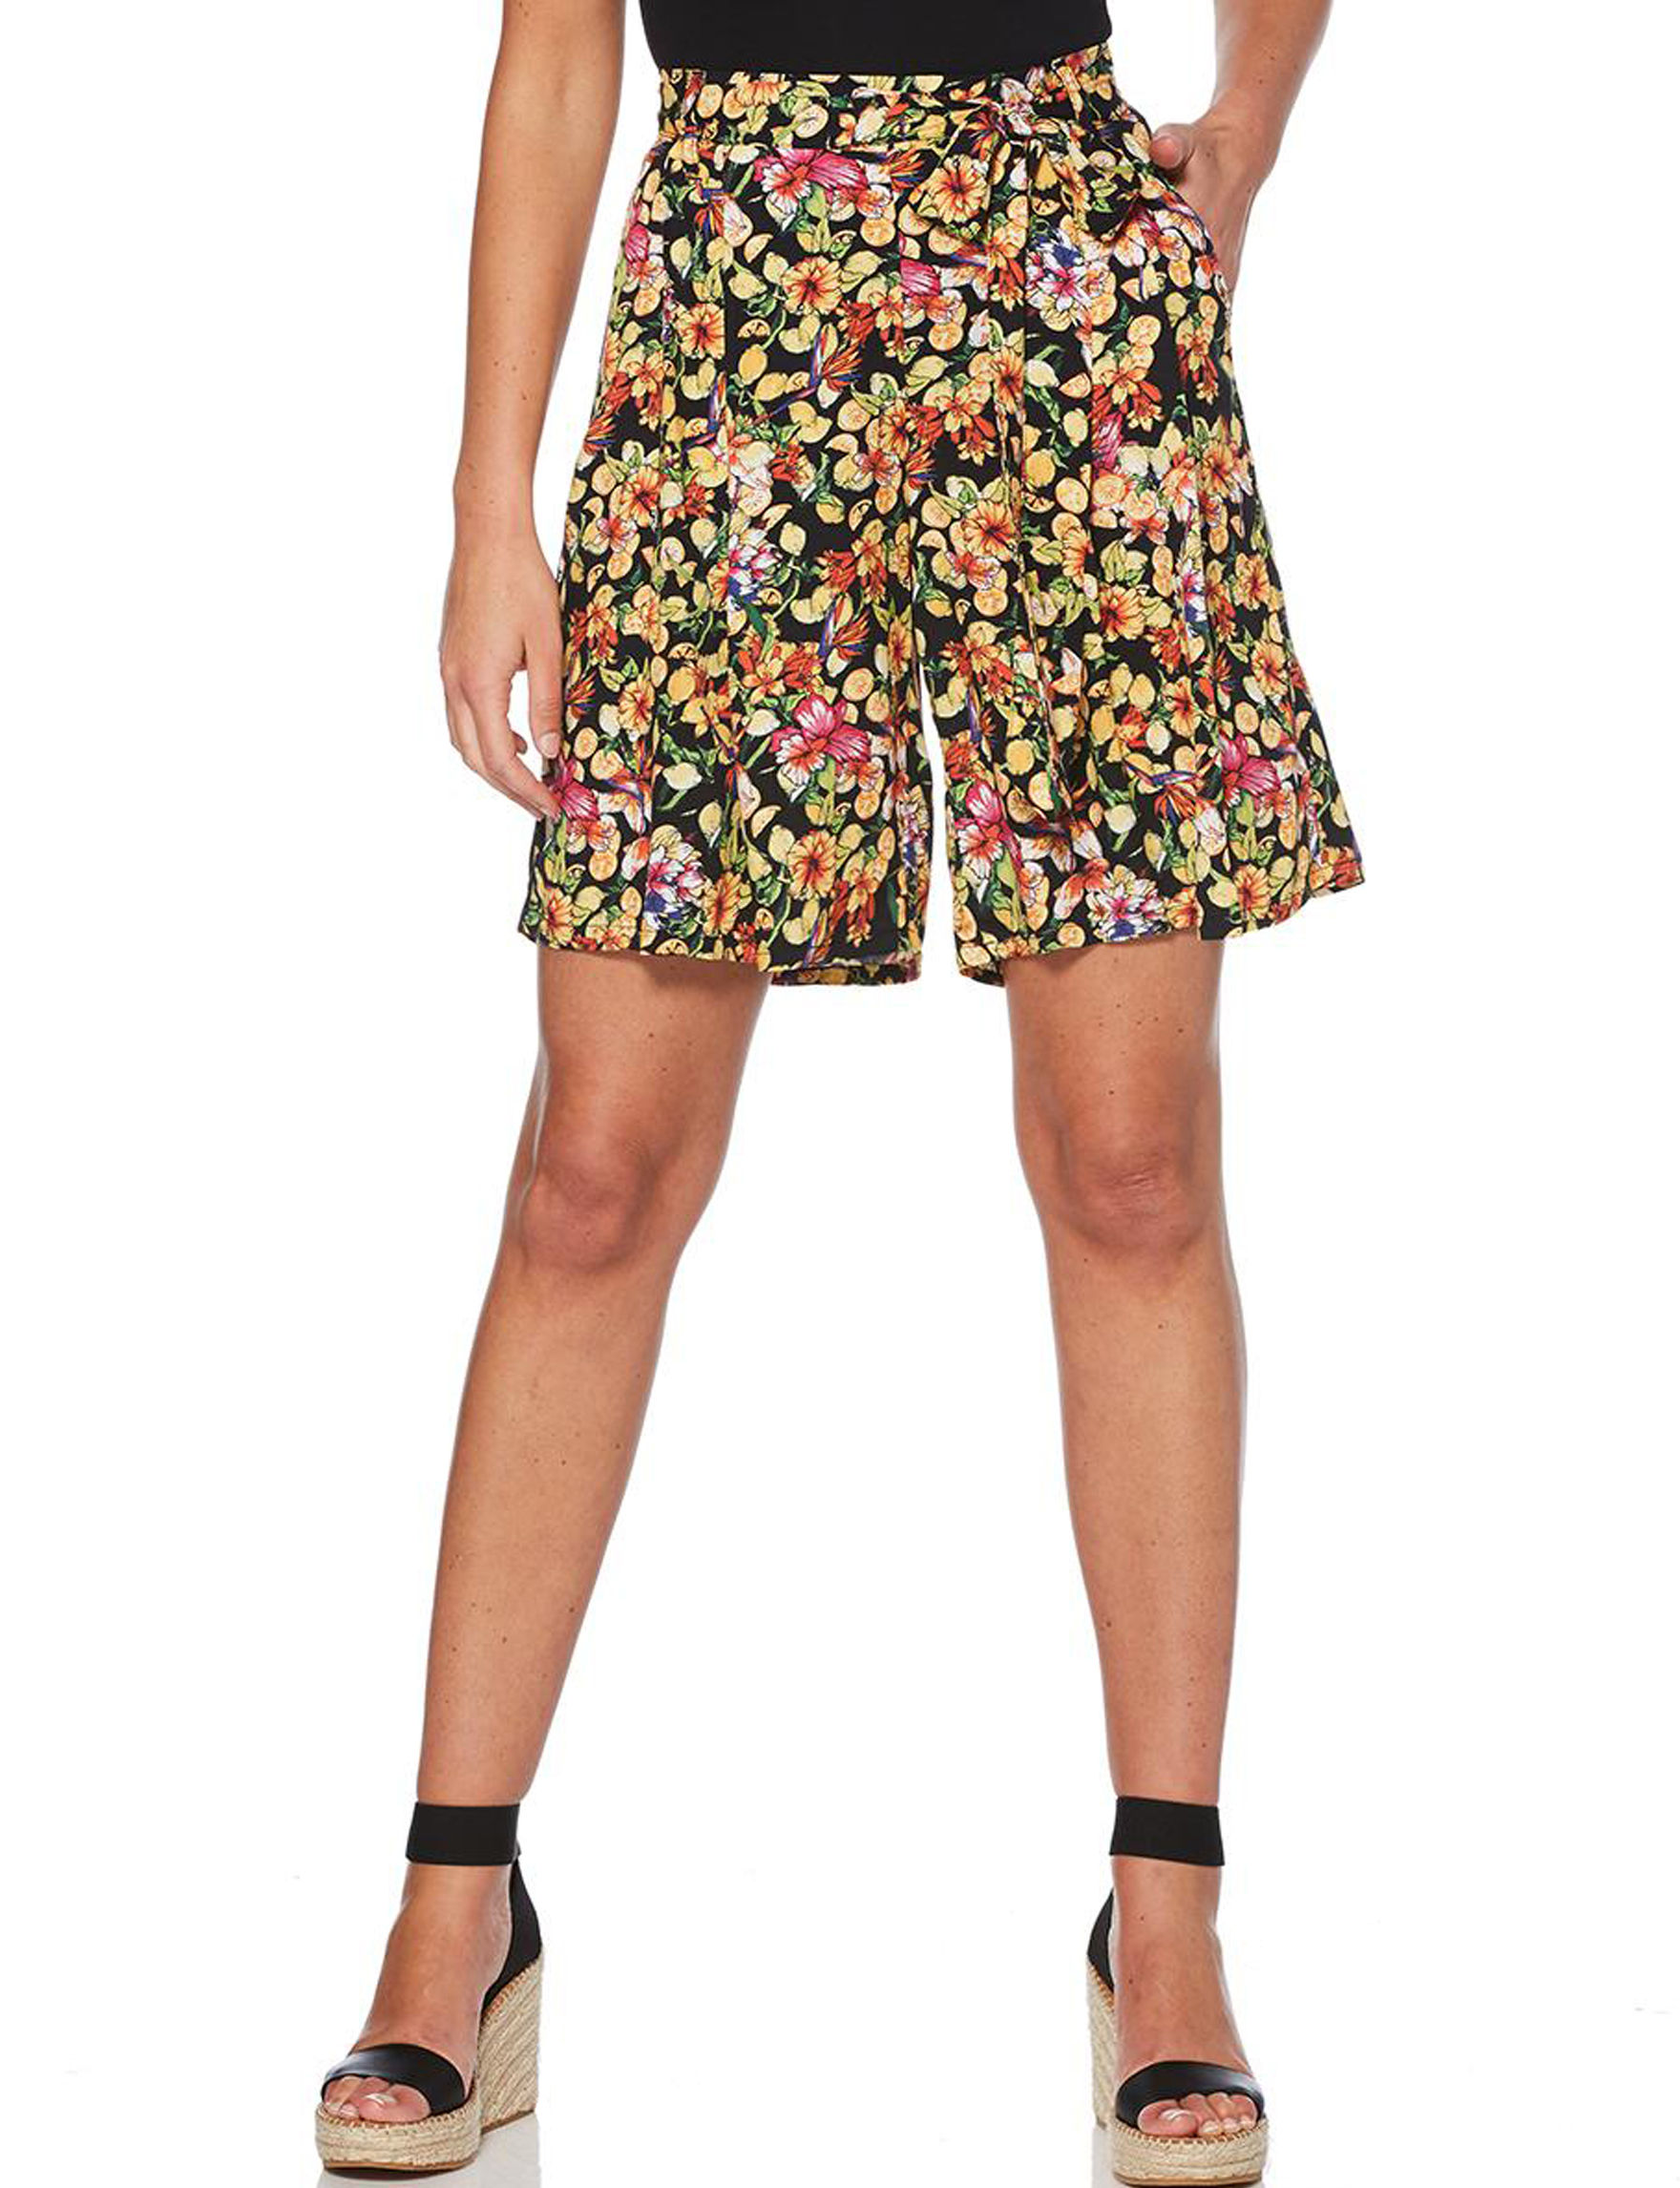 Rafaella Black Soft Shorts